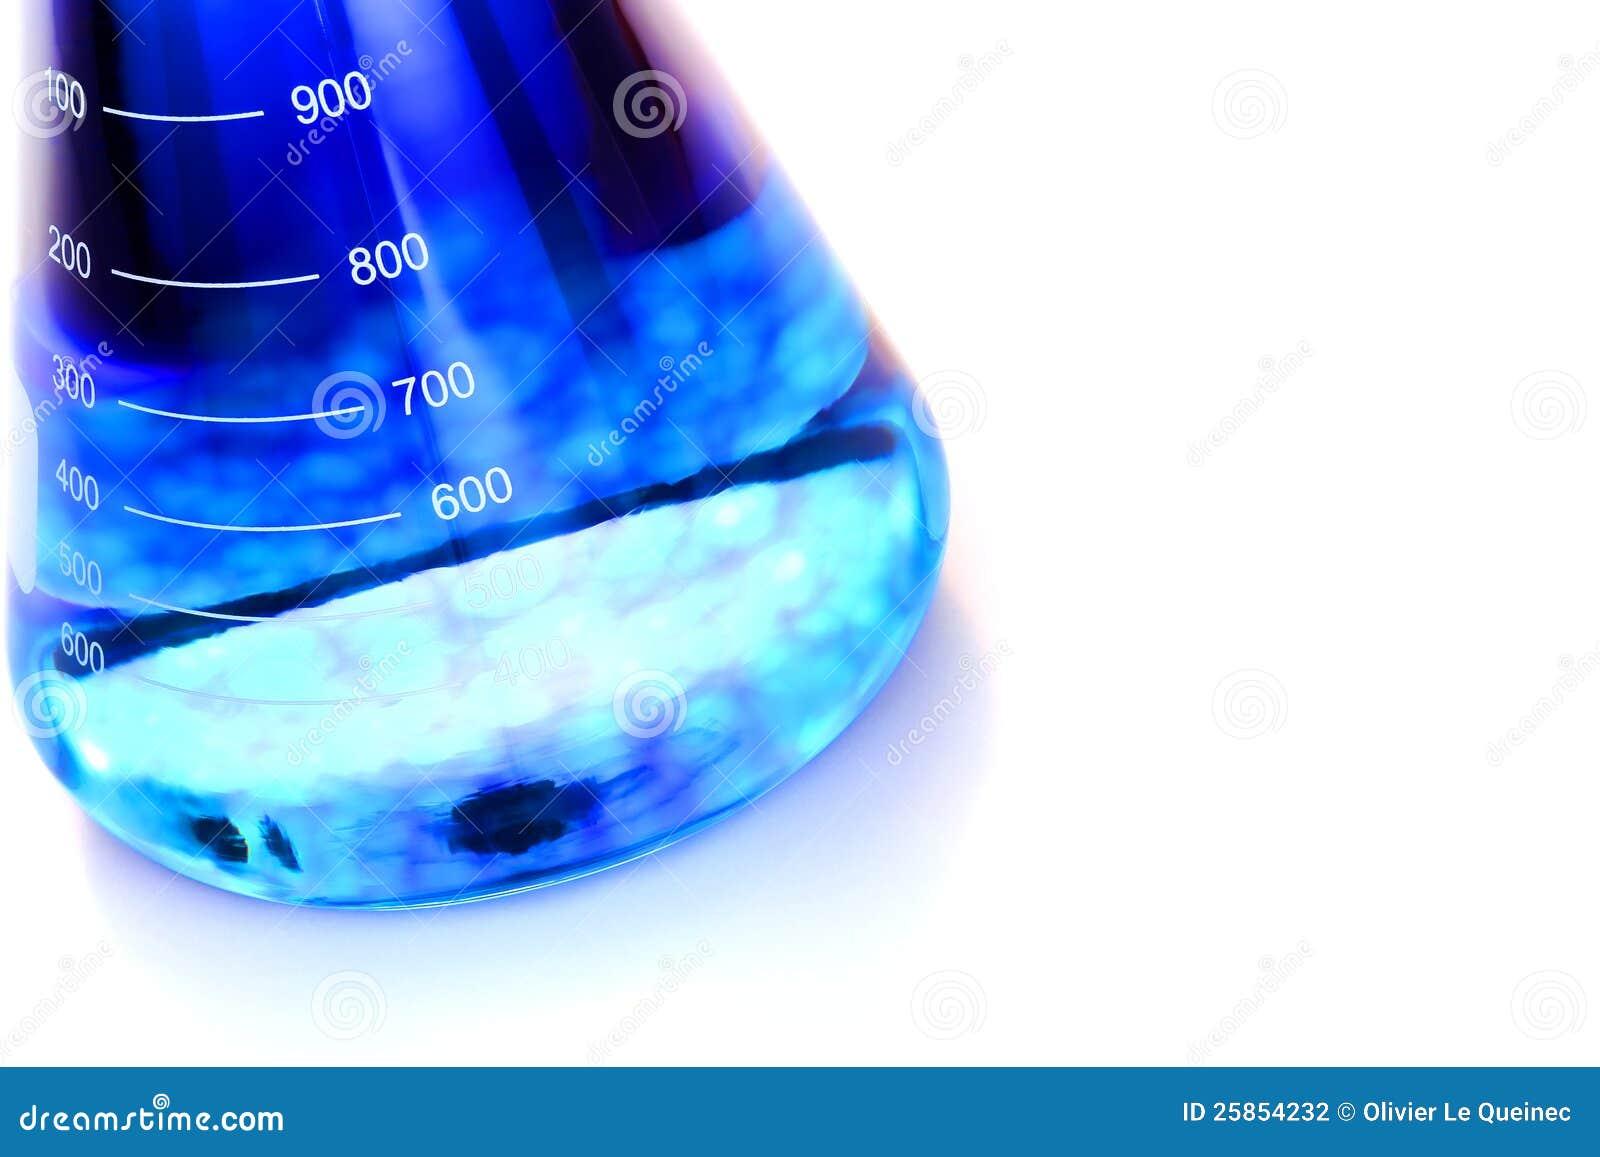 Scientific Laboratory Supplies Ltd